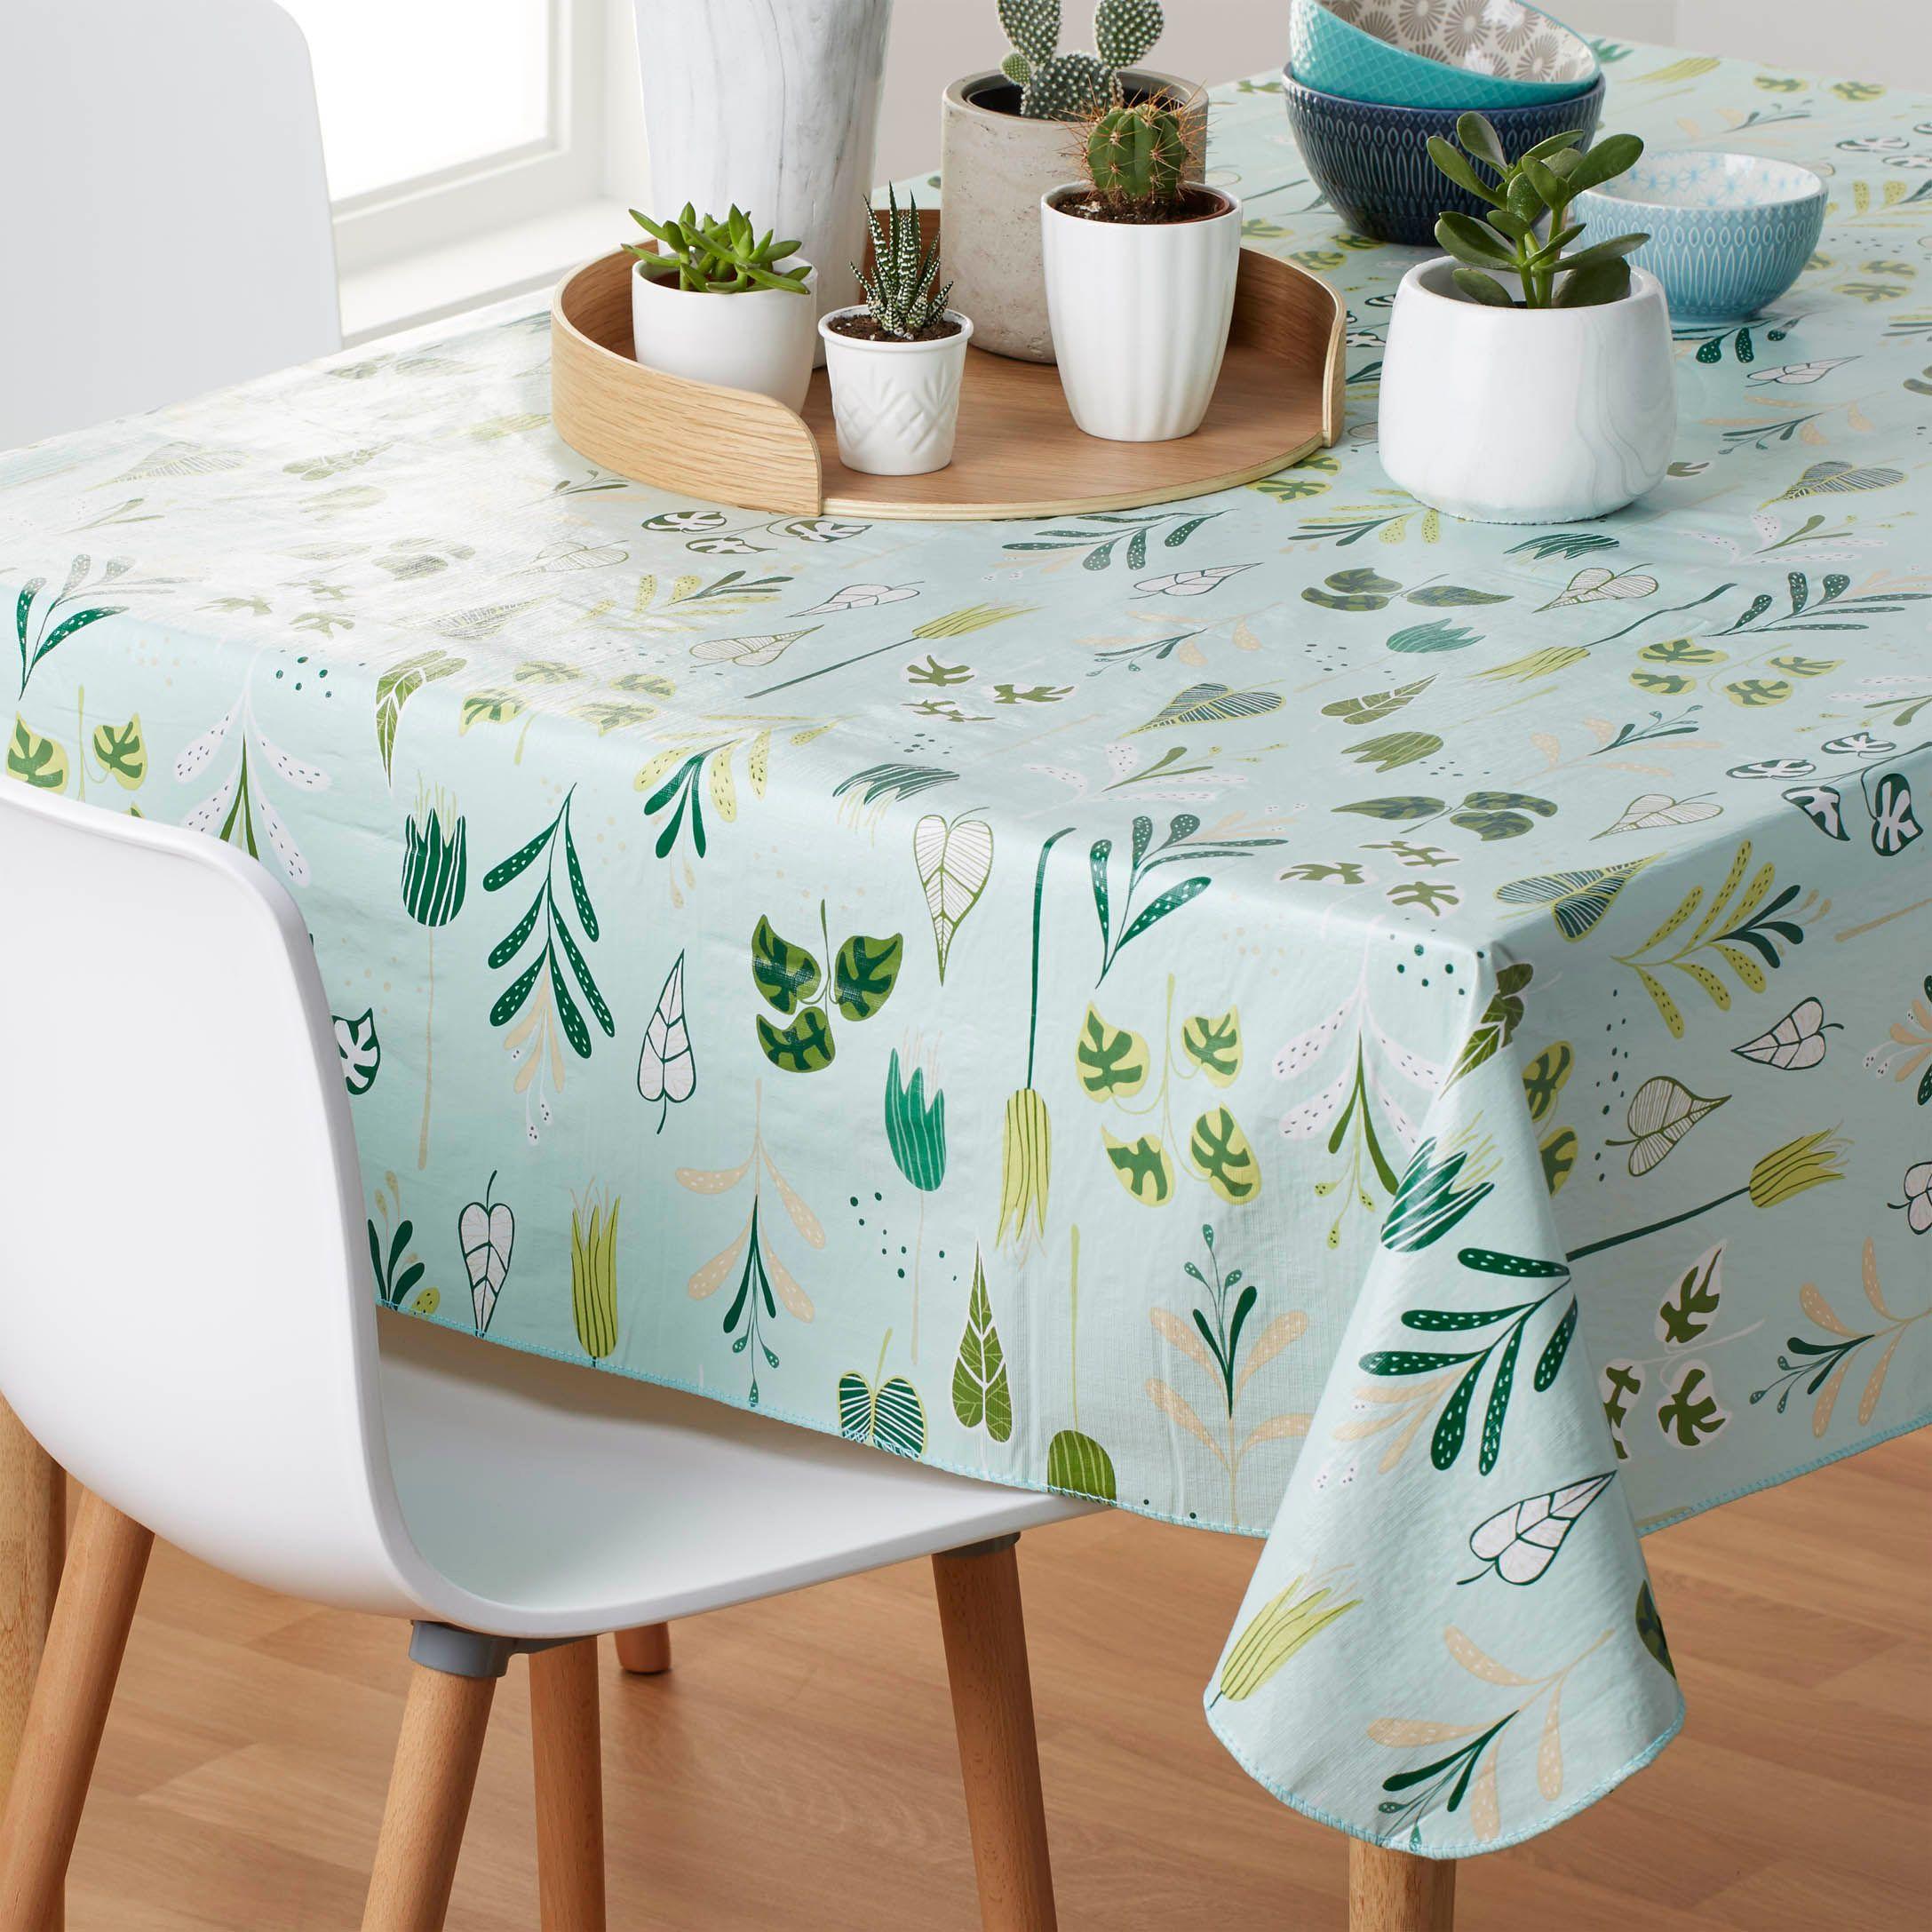 inner garden vinyl tablecloth - Vinyl Tablecloths